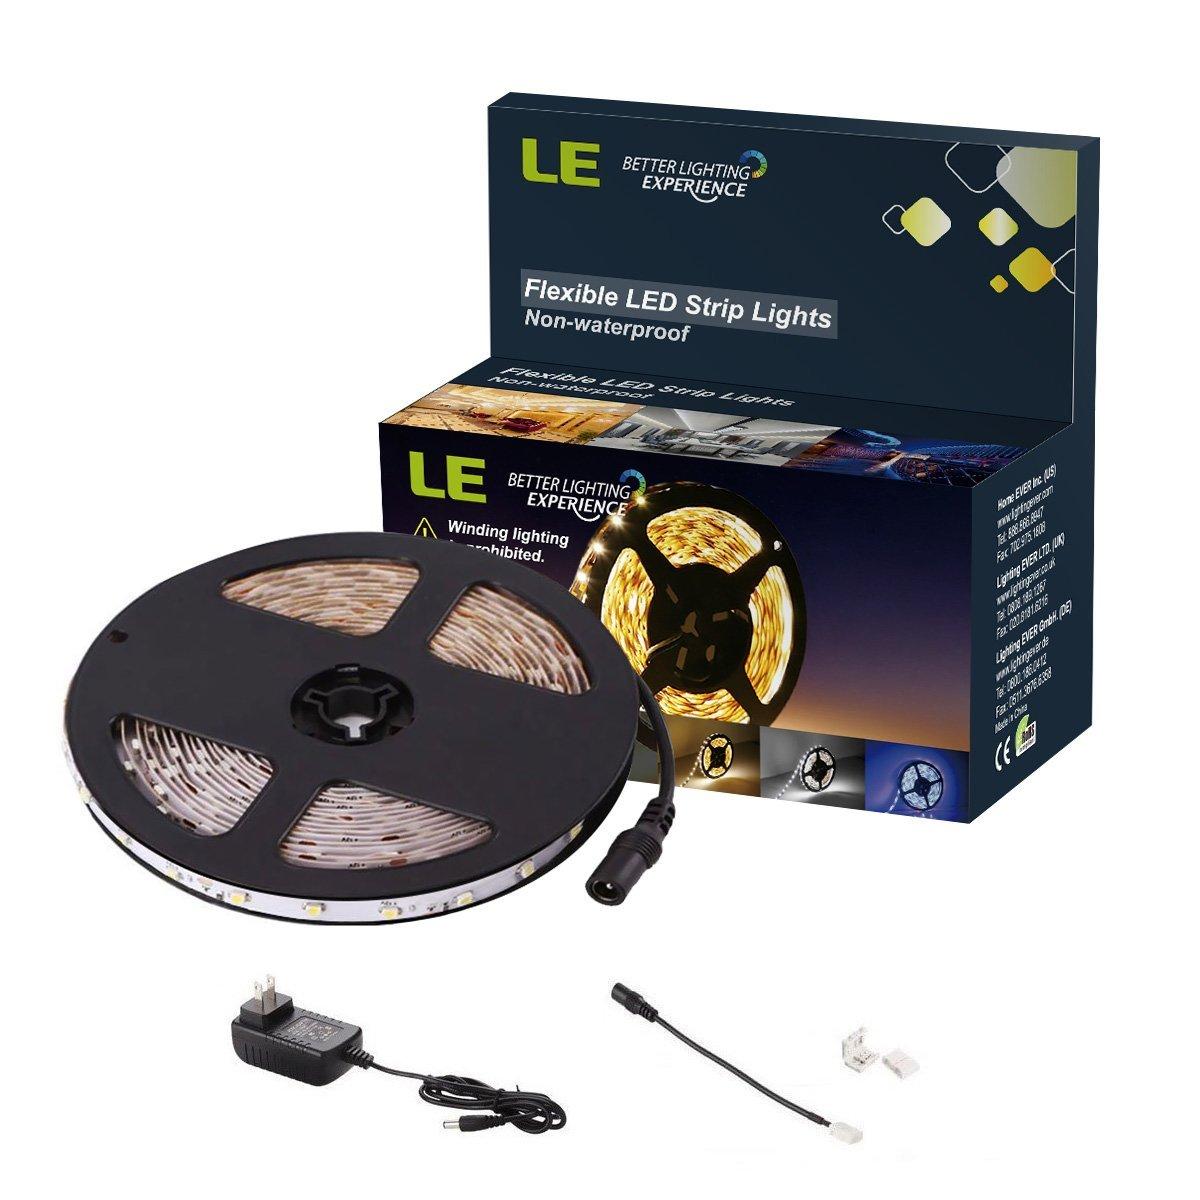 LE 16.4ft 12V Flexible LED Light Strip, LED Tape, 6000K Daylight White, 300 Units SMD 2835 LEDs, Non Waterproof, LED Ribbon, LED Light Strips, For Home/Kitchen/Car/Bar, Power Adapter Included